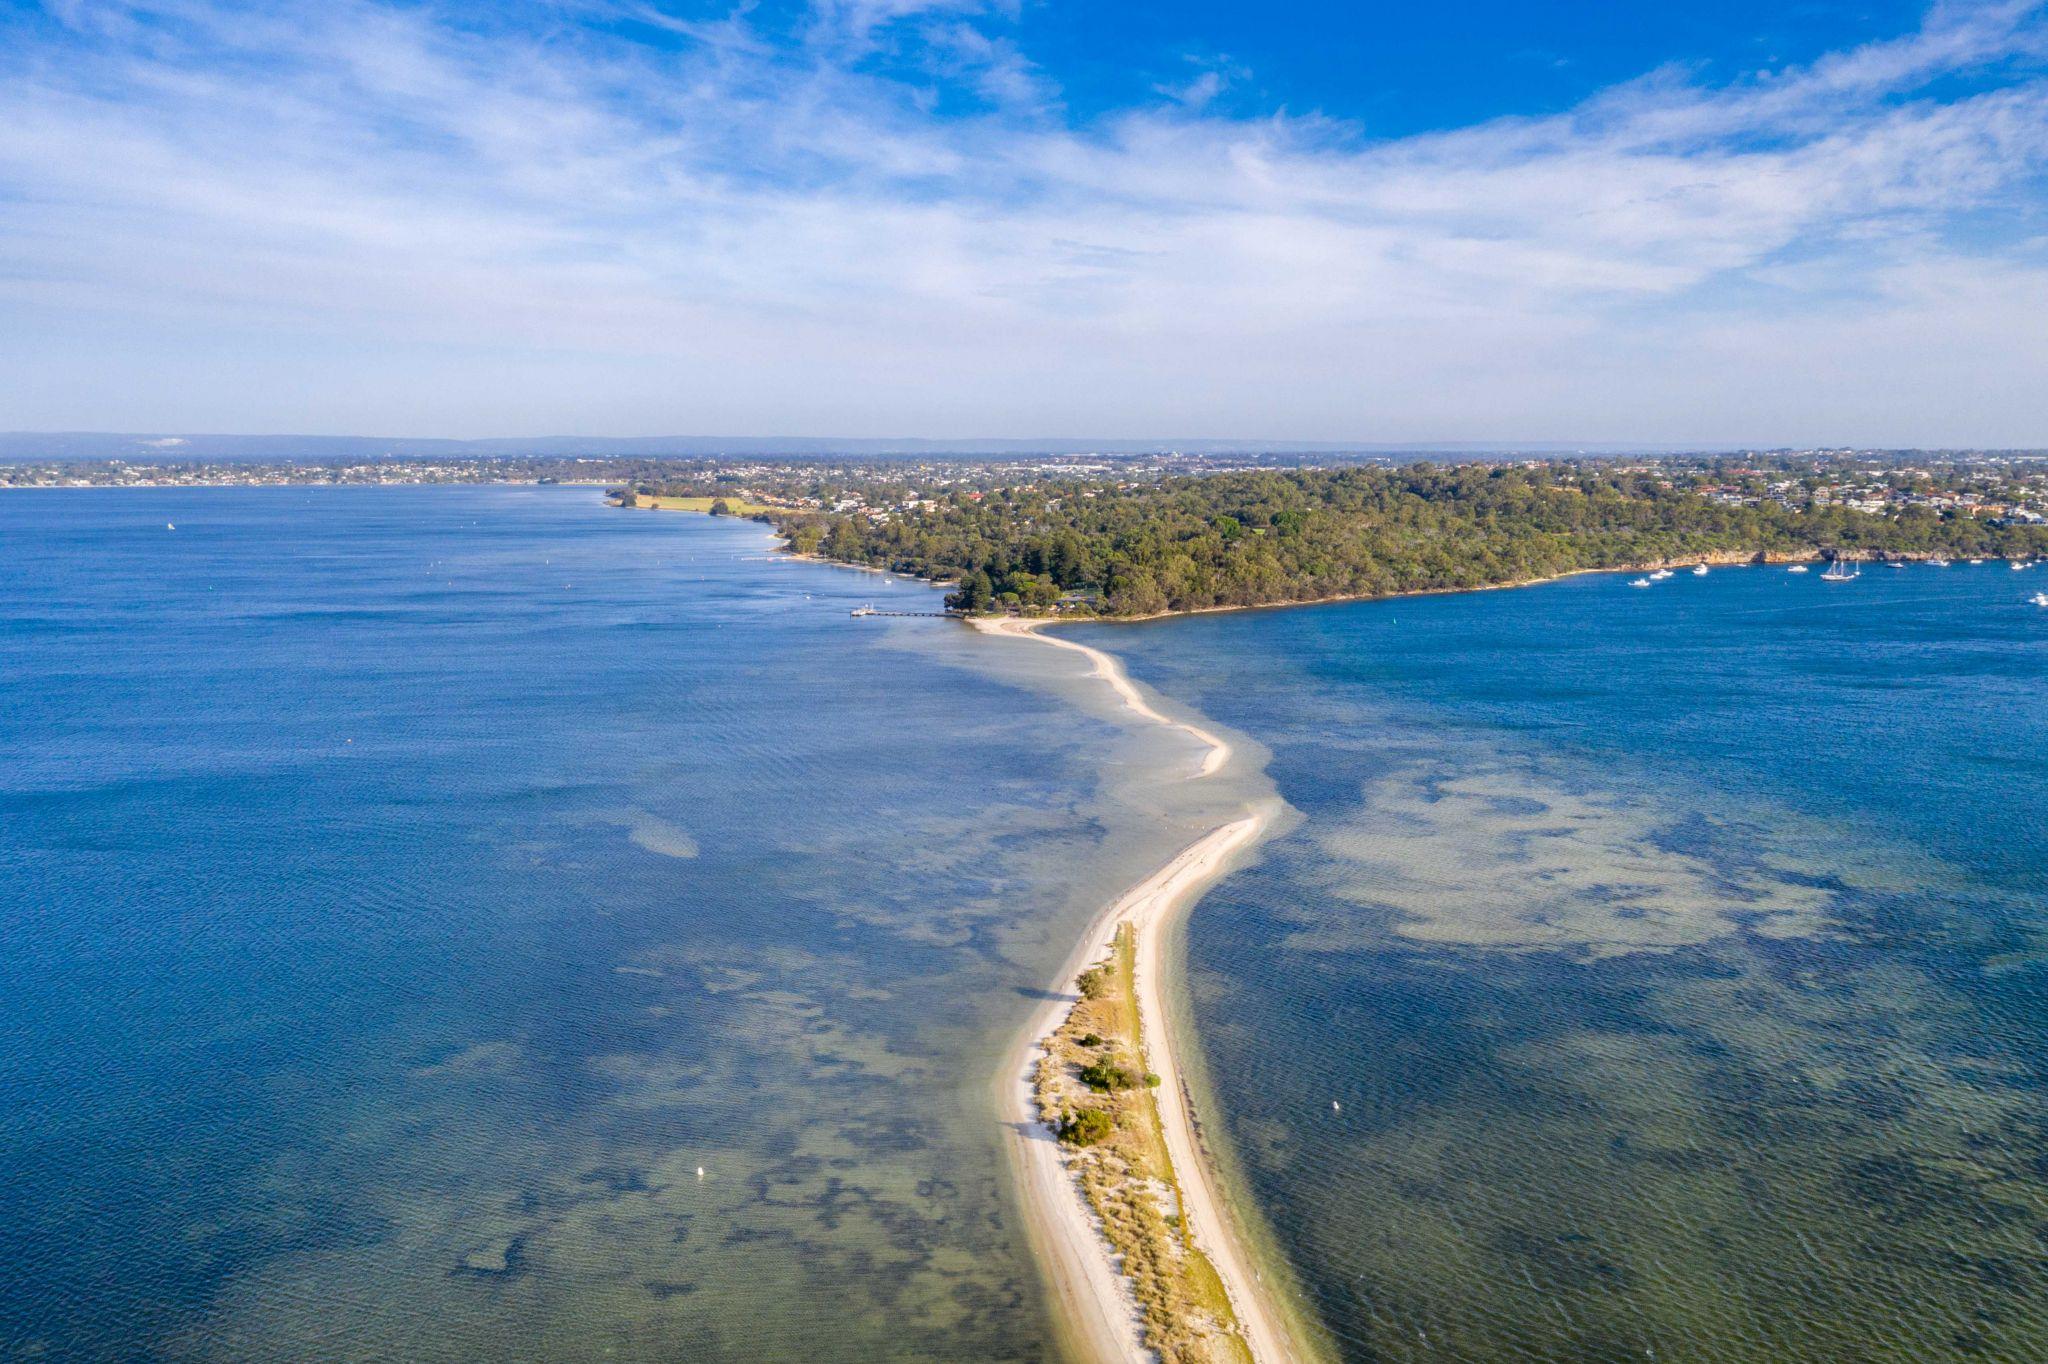 Point Walter sand bar Dyoondalup, Perth, Western Australia, Australia